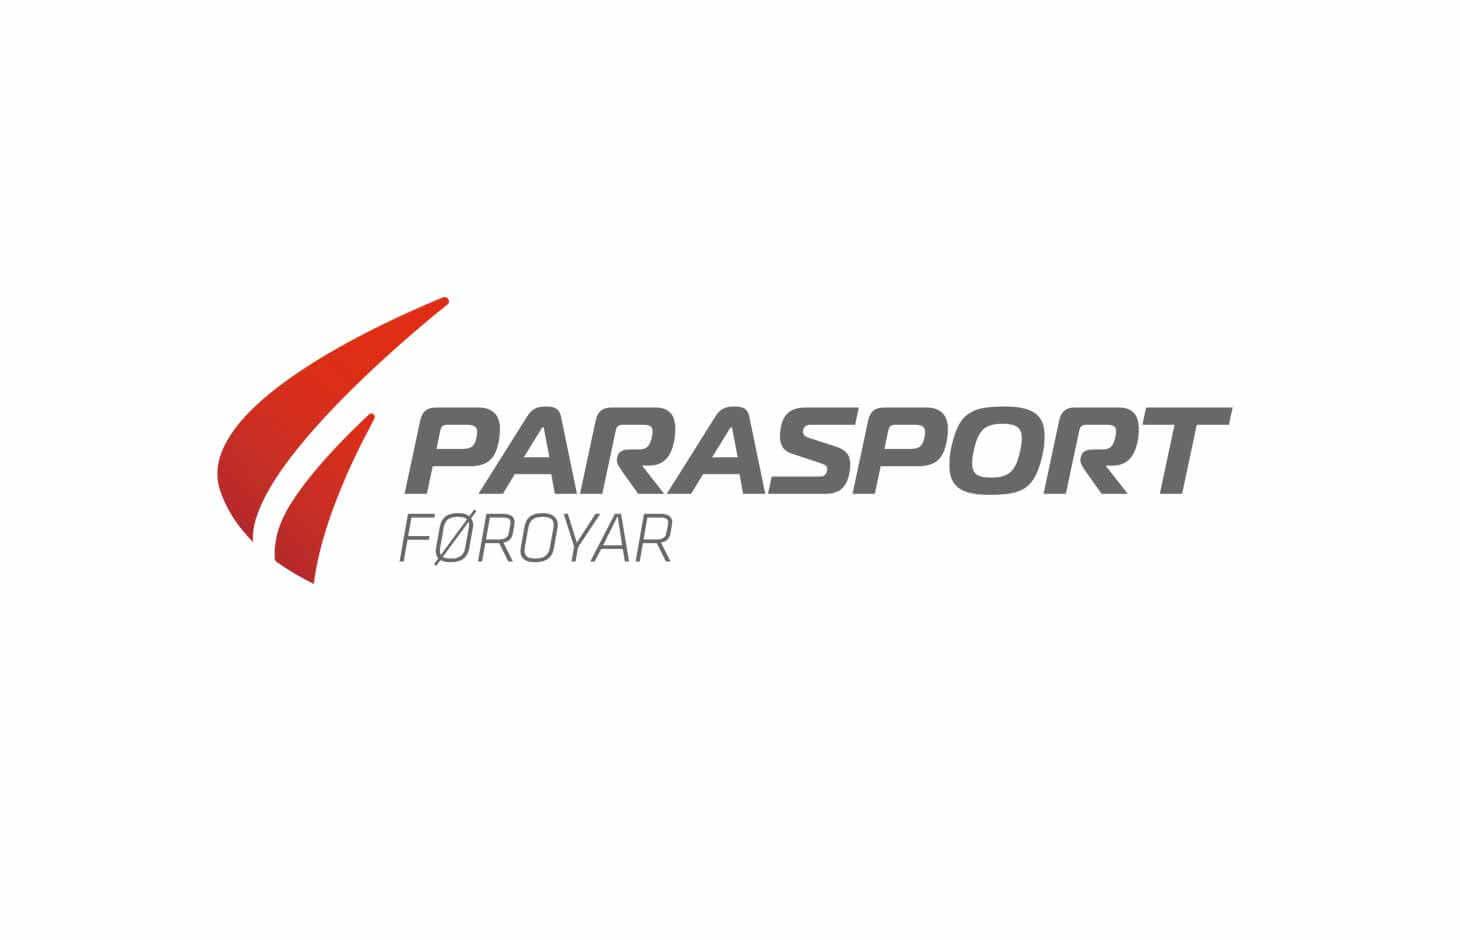 Parasport Føroyar